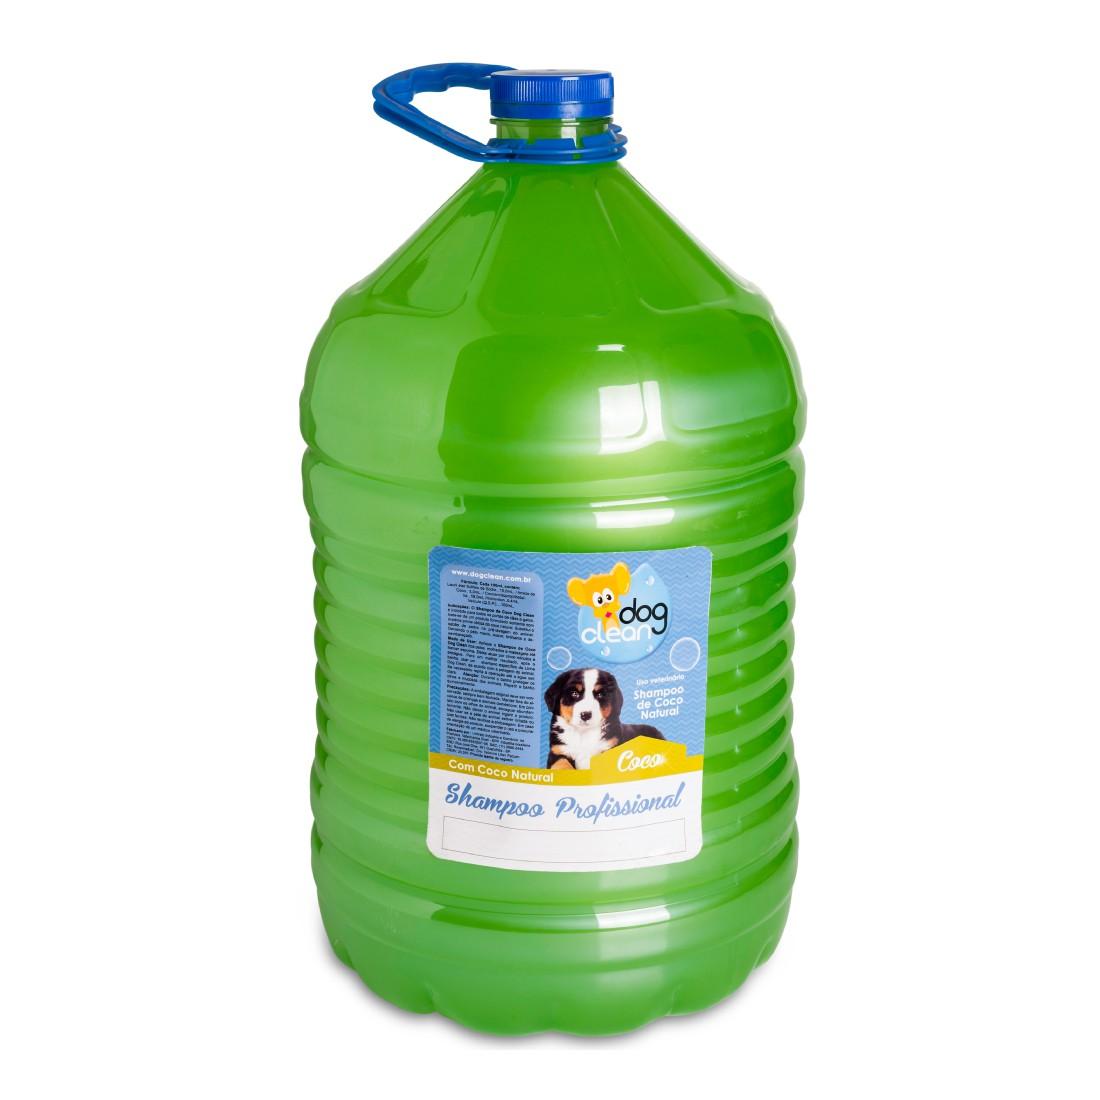 Shampoo Profissional Coco 5L Dog Clean